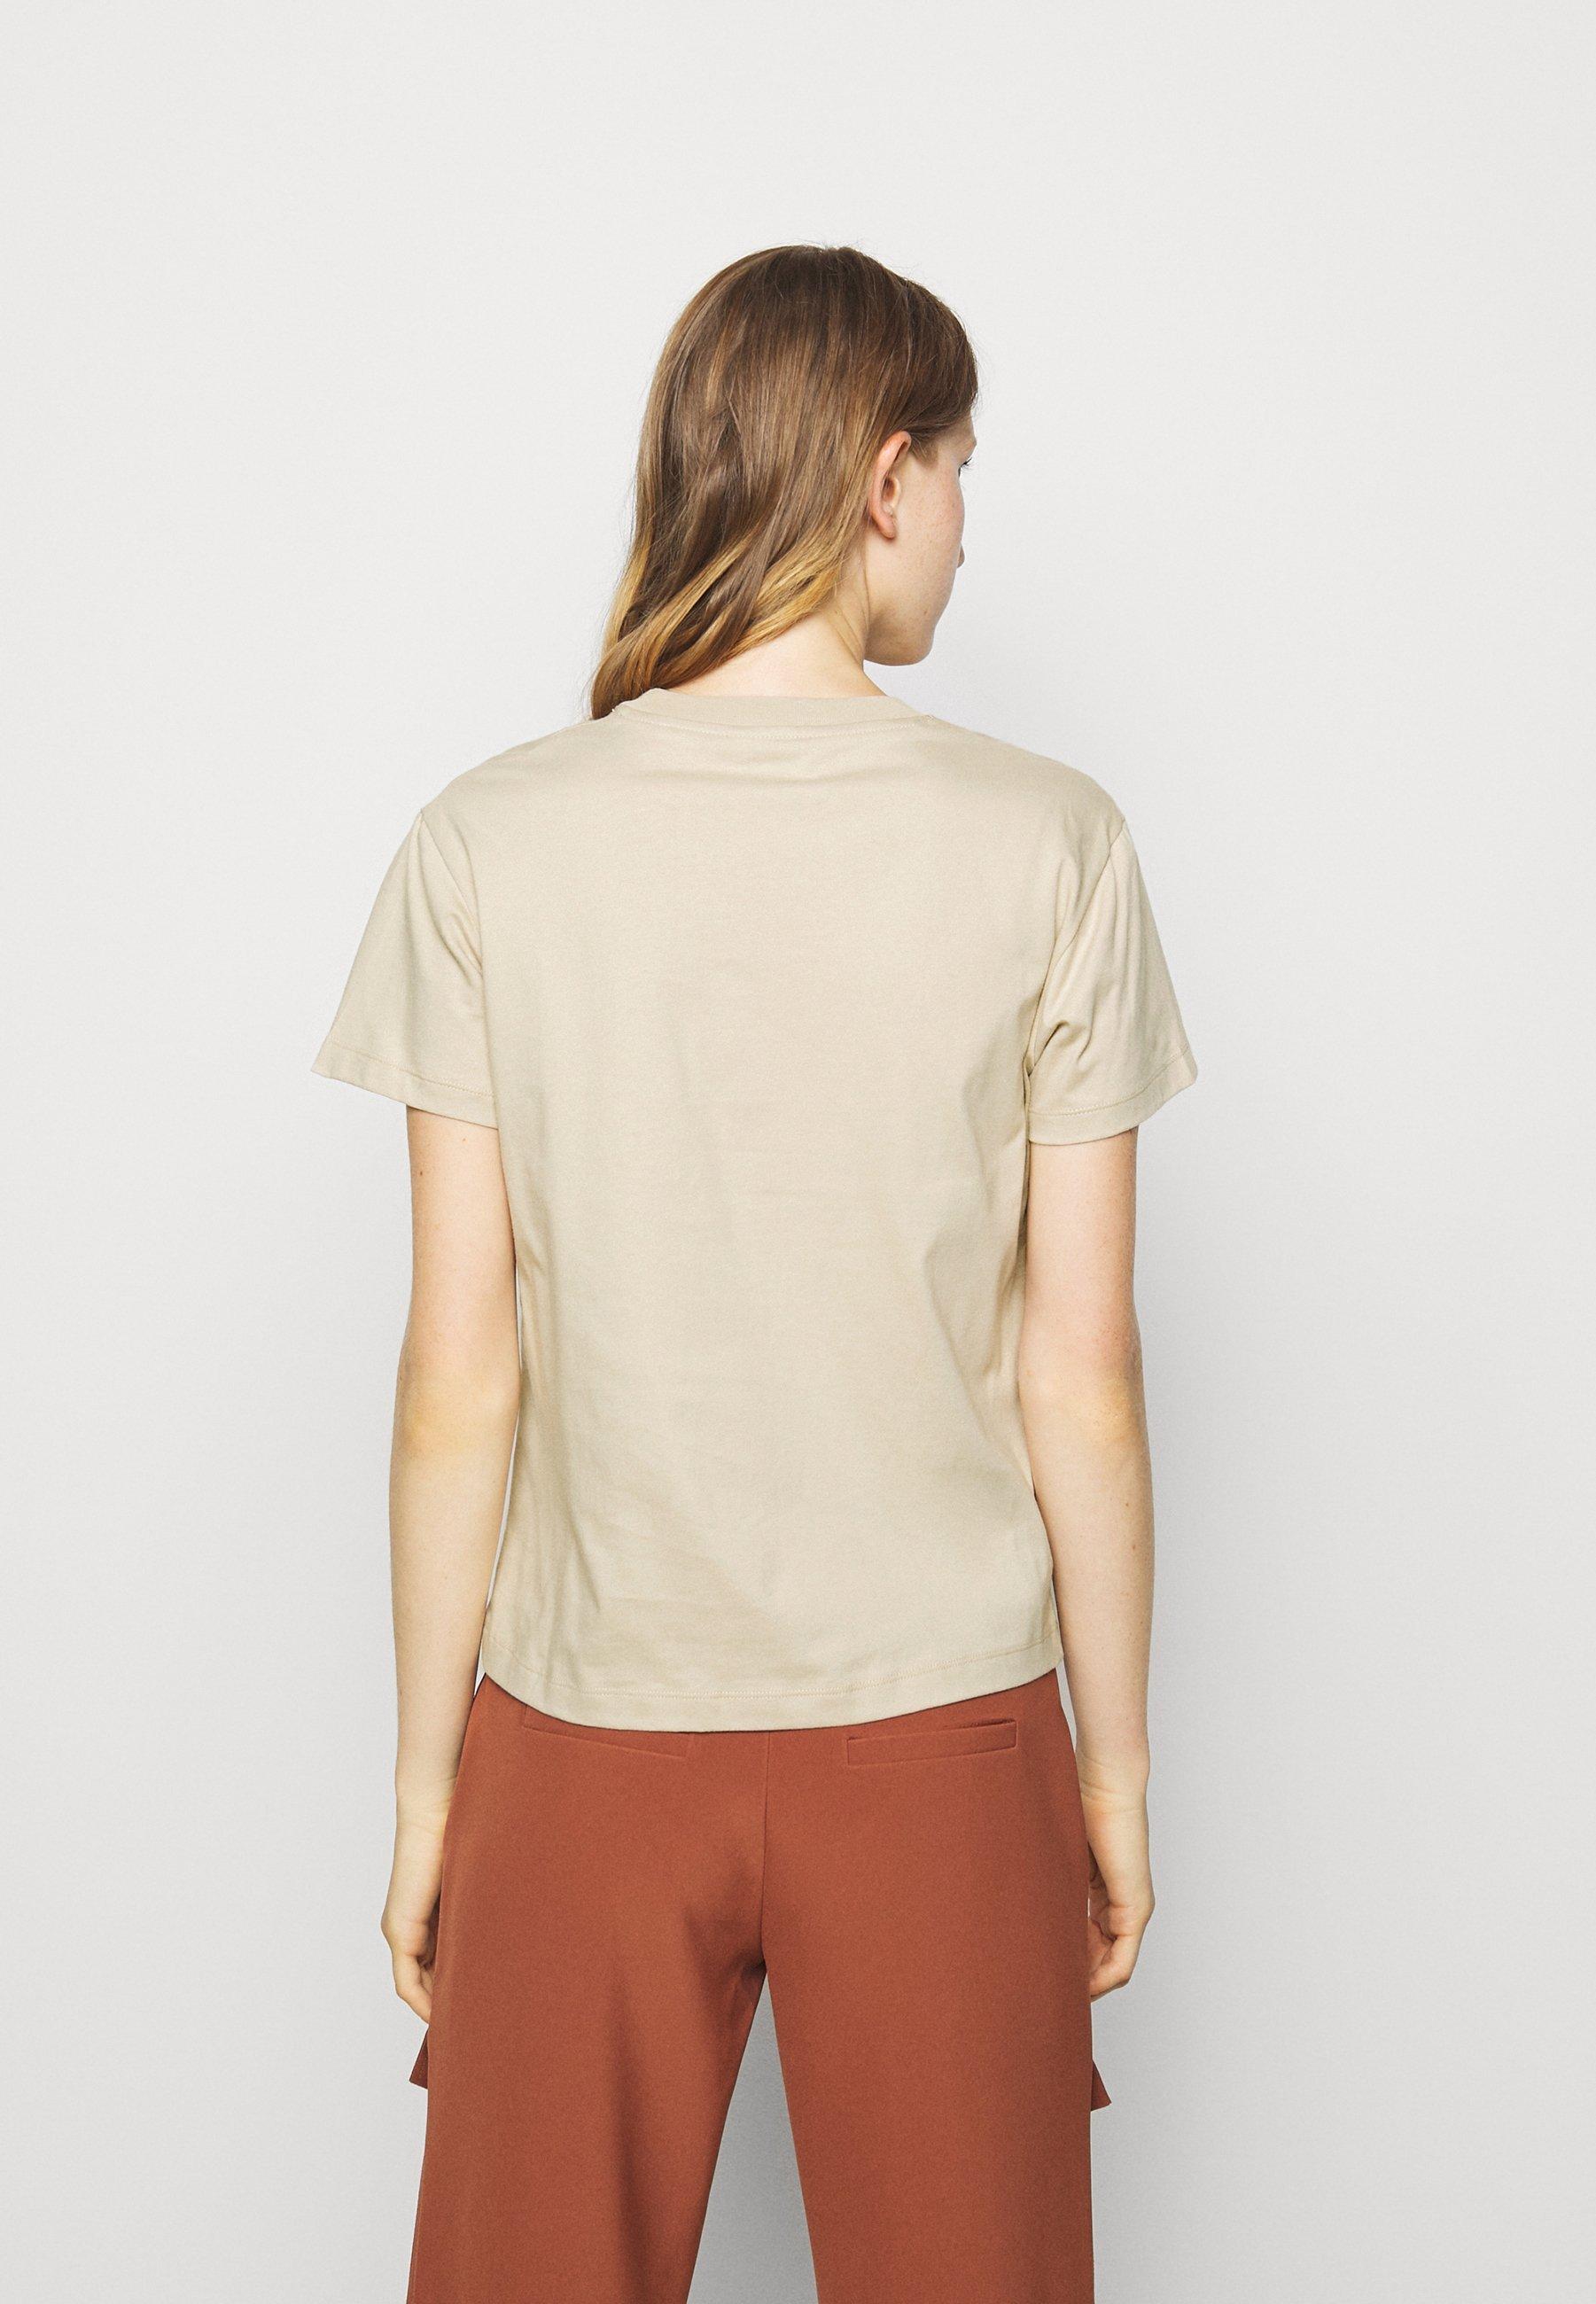 Holzweiler Suzana - T-shirts Med Print Tan/beige